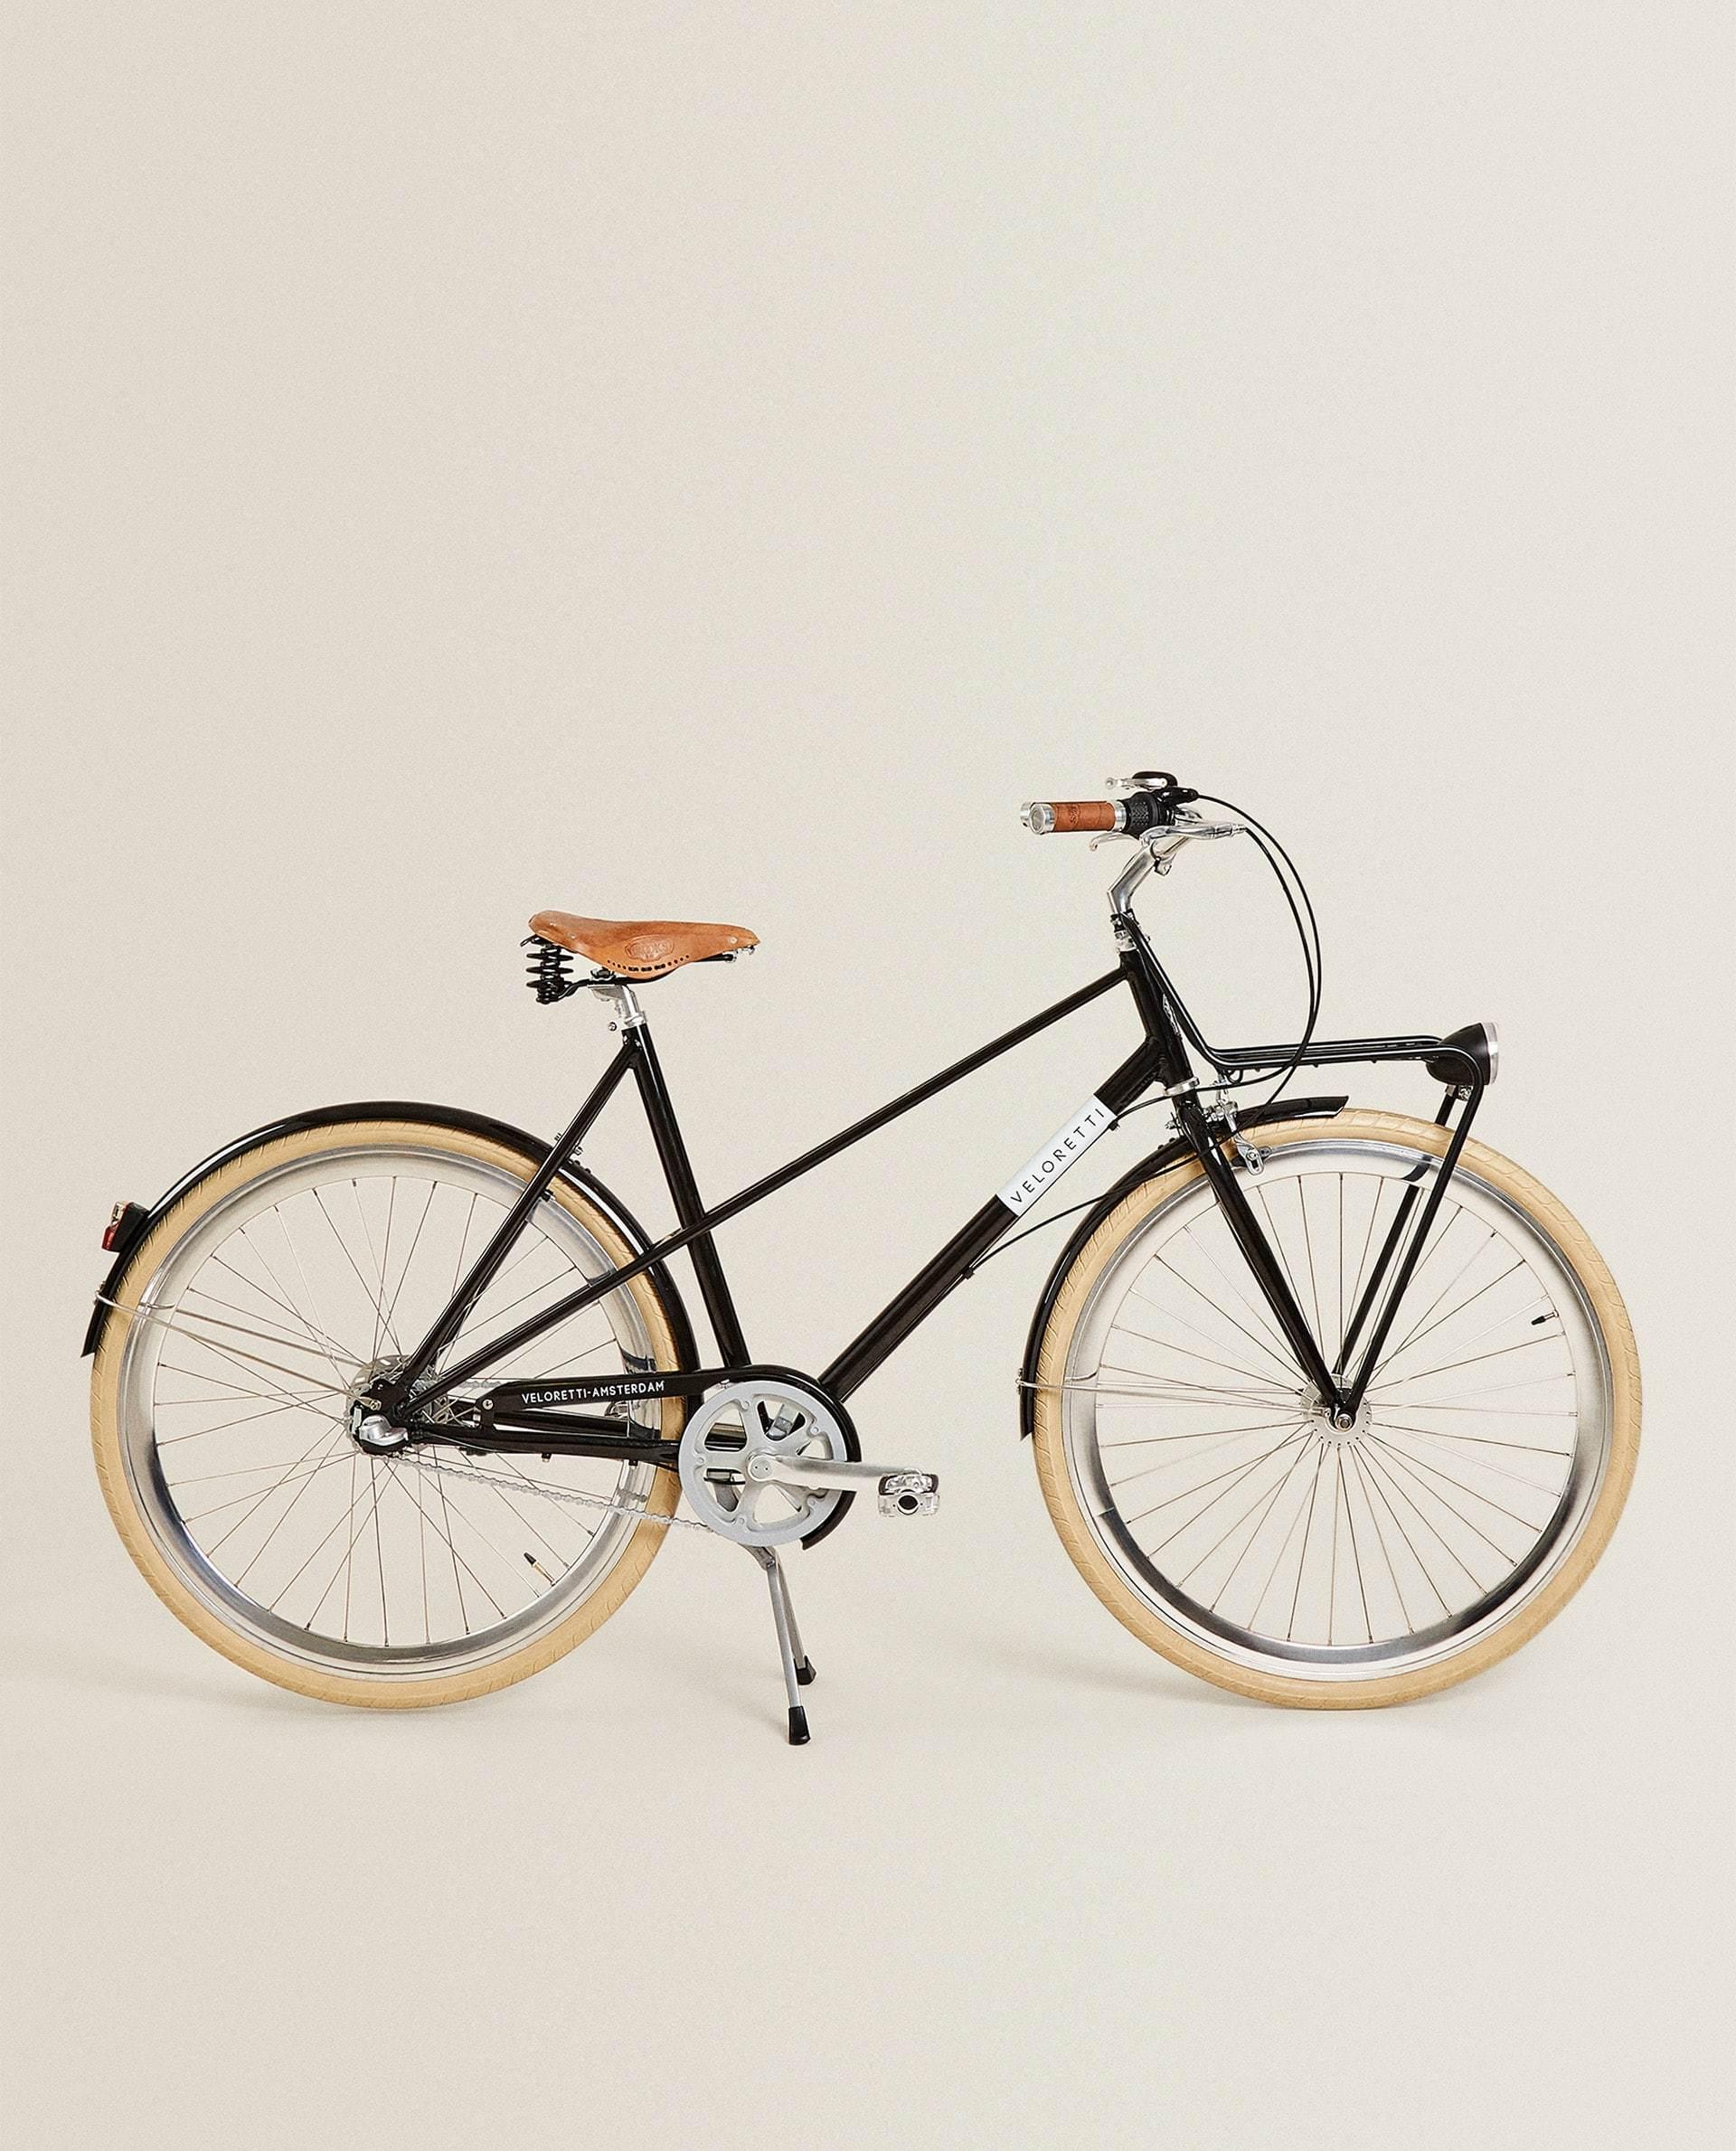 Bicicleta veloretti de barra baja